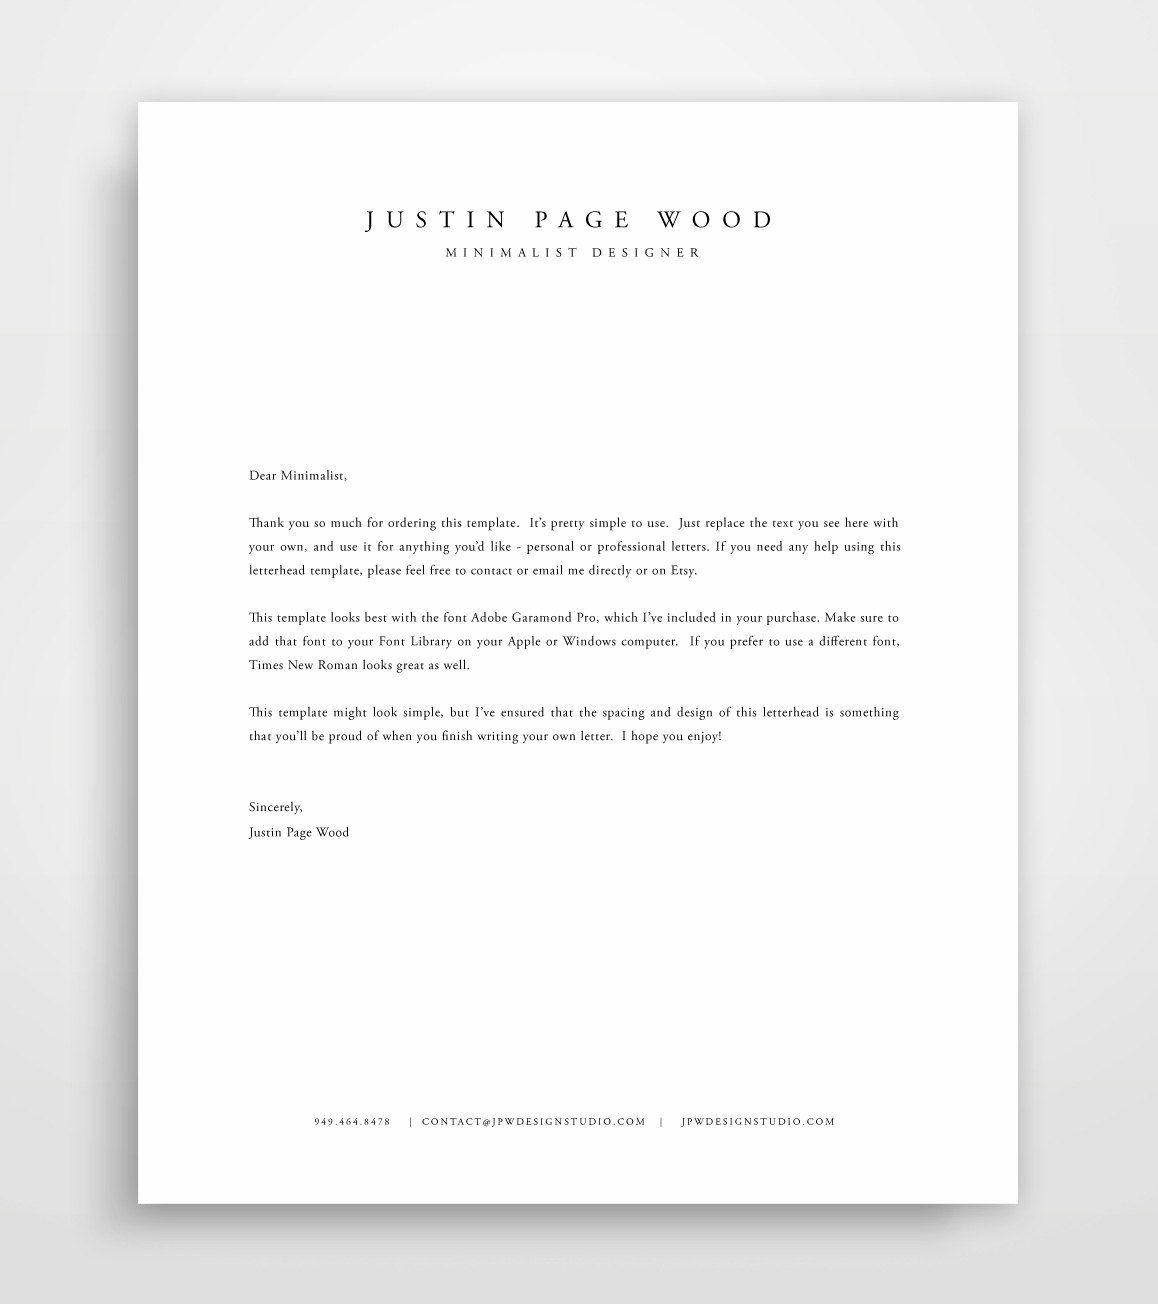 Letterhead Template Word, Letterhead Design, Templates Free, Design  Templates, Cover Letter Resume, Design Studios, Illustrator, Home Design,  Fonts  Free Personal Letterhead Templates Word